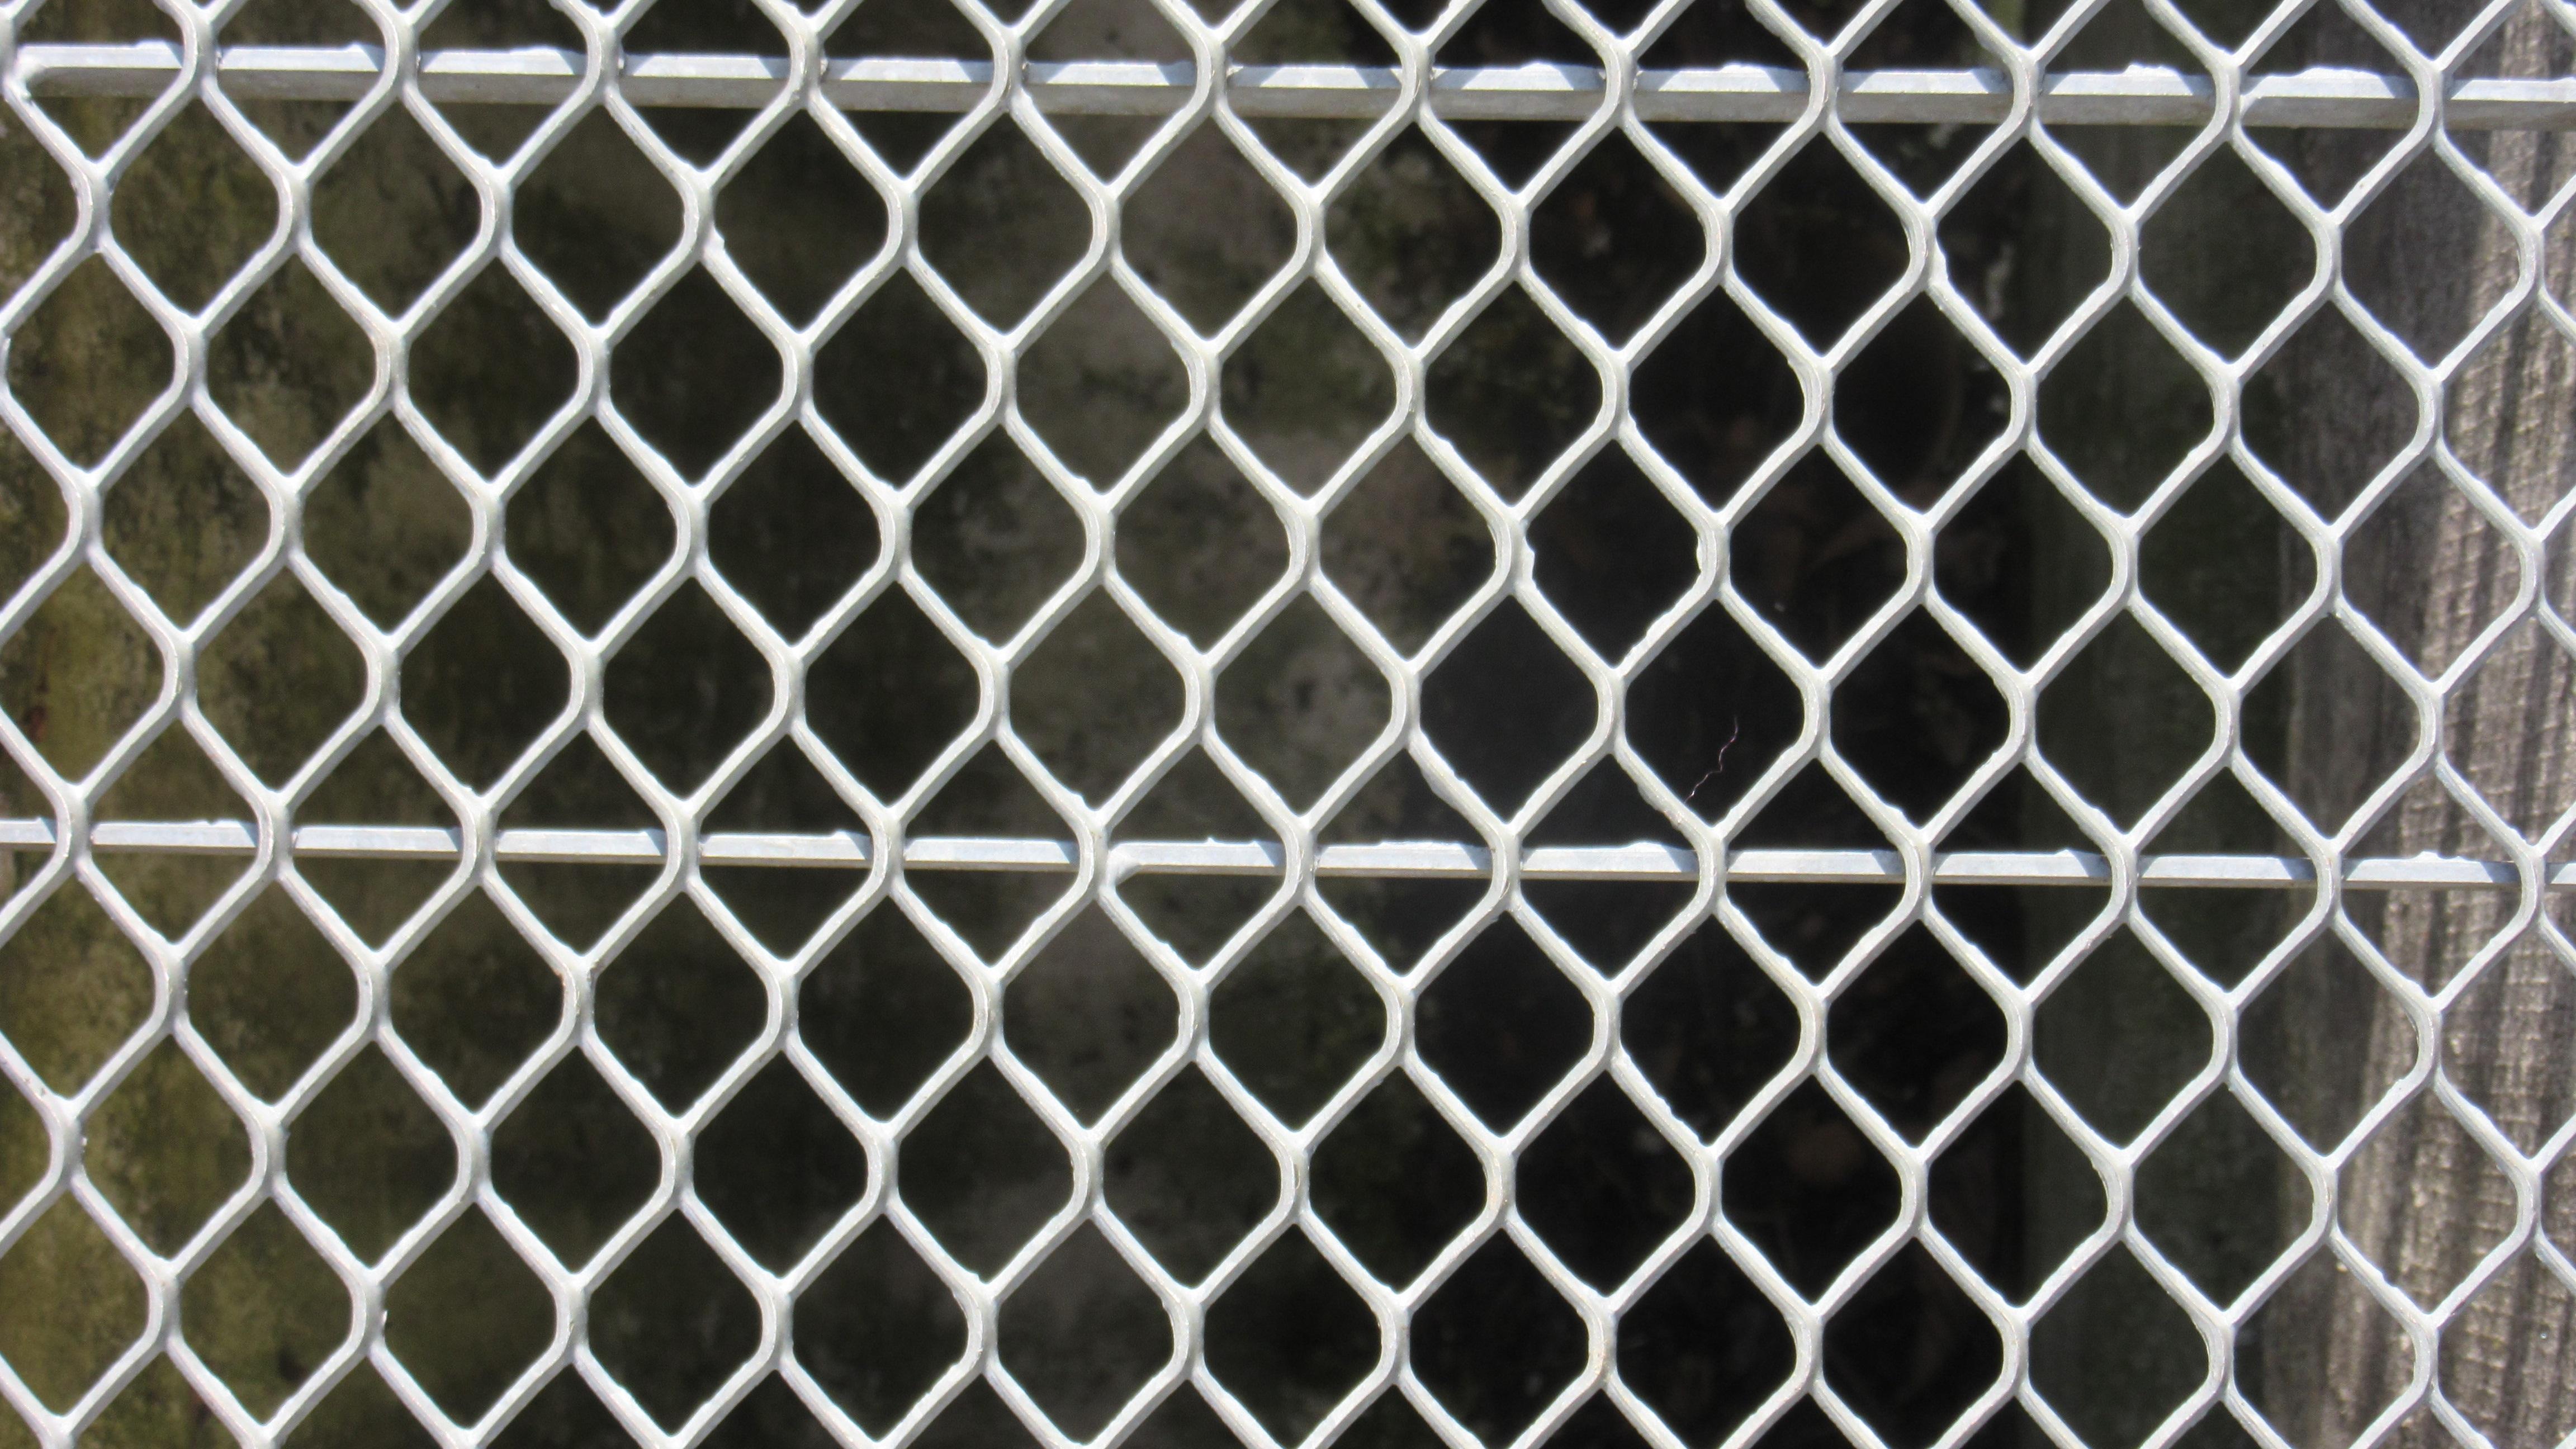 Free Images : fence, pattern, metal, material, net, mesh, steel grid ...